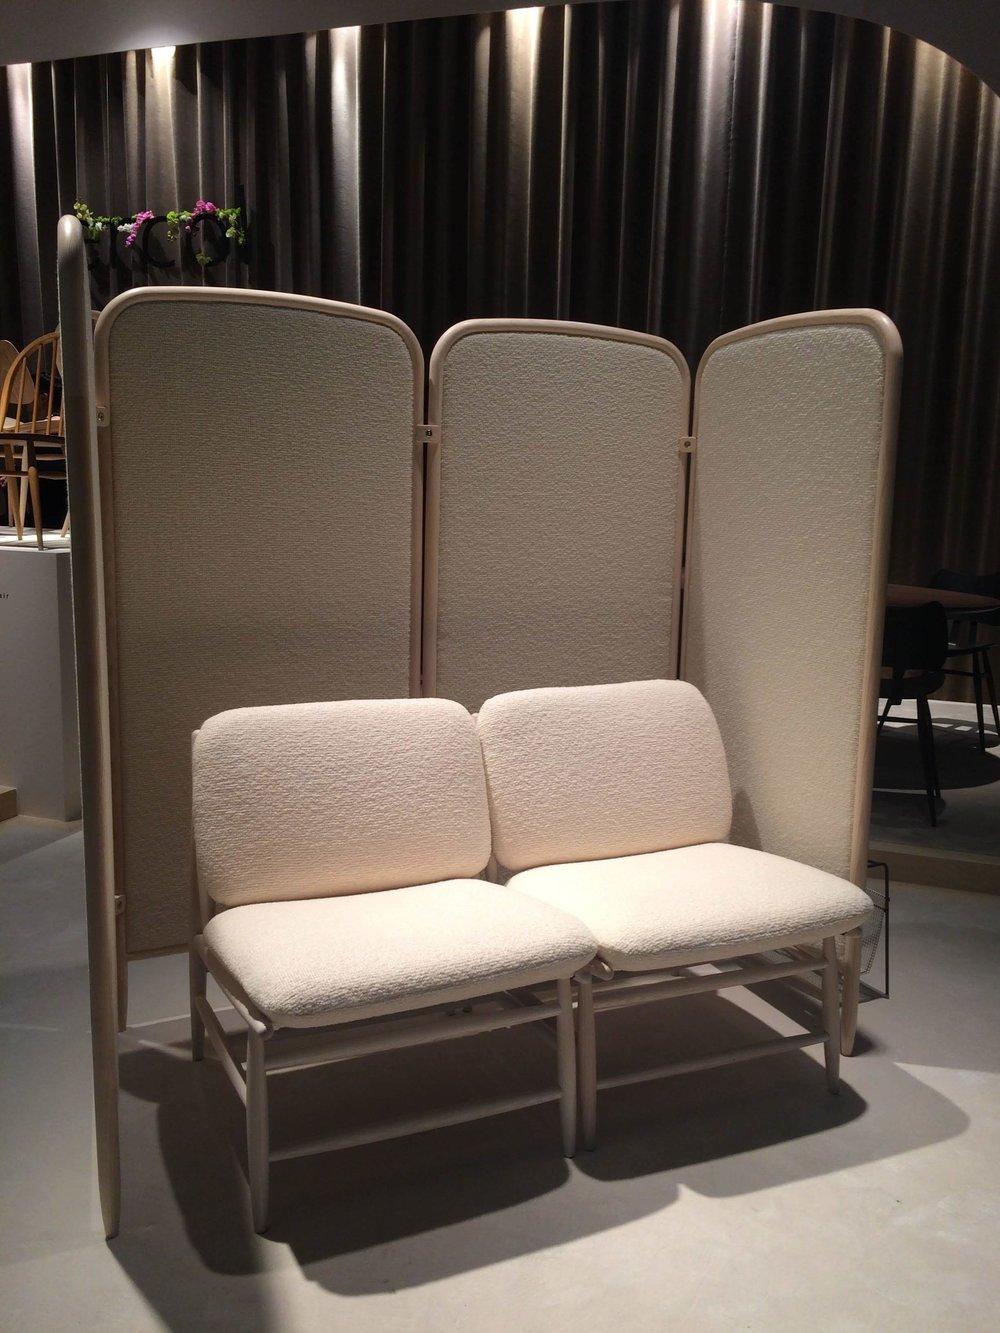 Von chairs by Hlynur Atlason. ERCOL